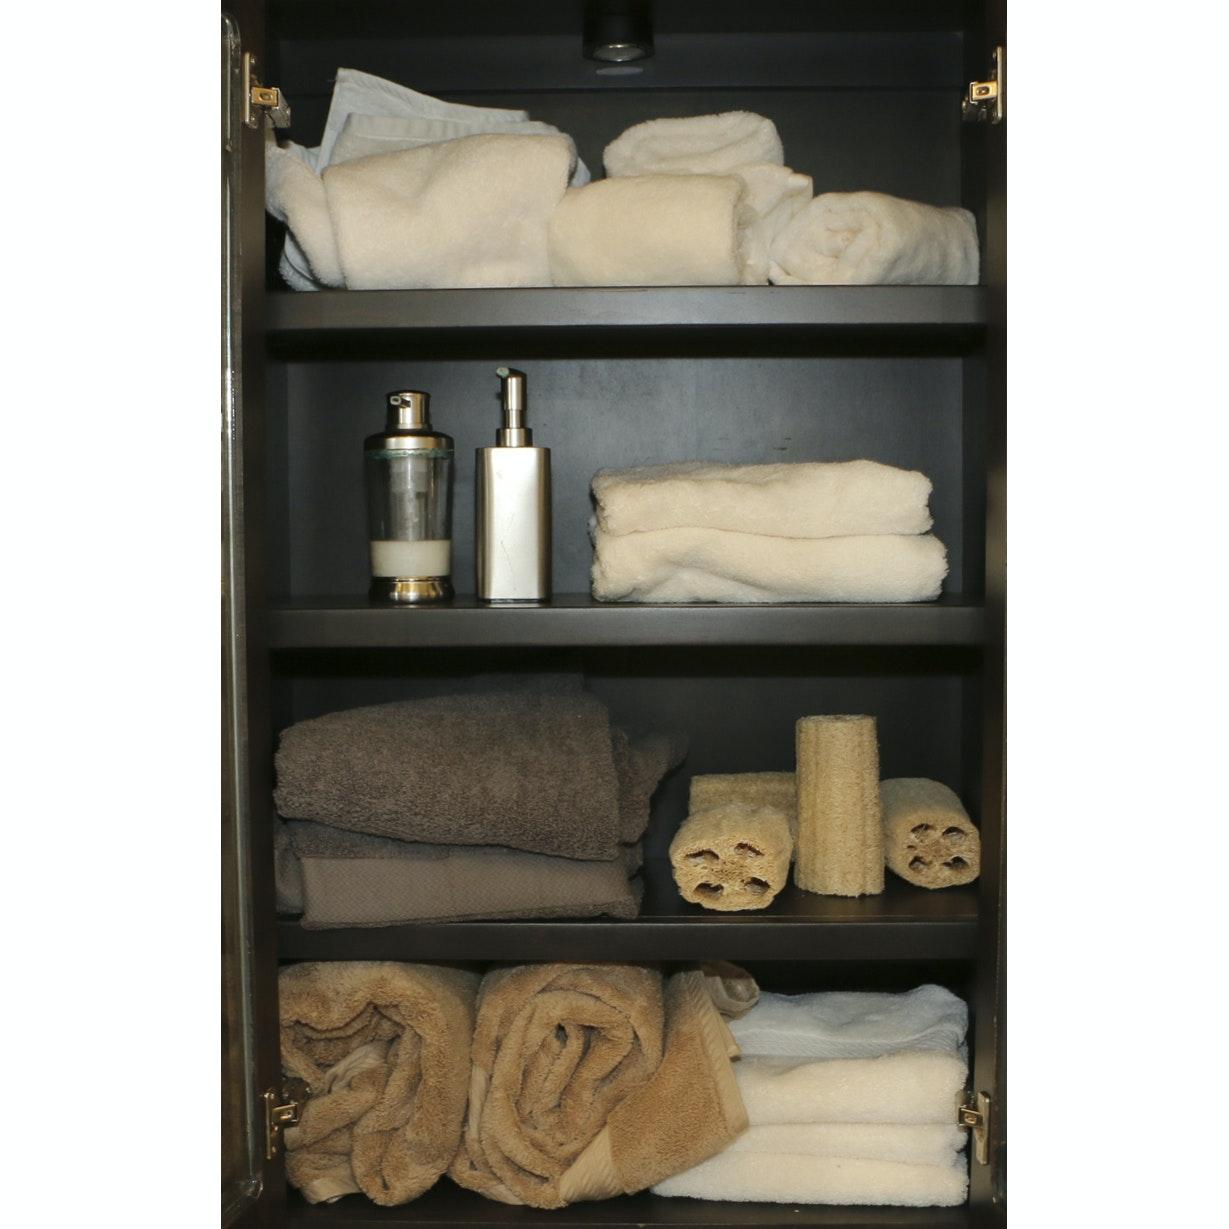 Bathroom Towels and Soap Dispensers